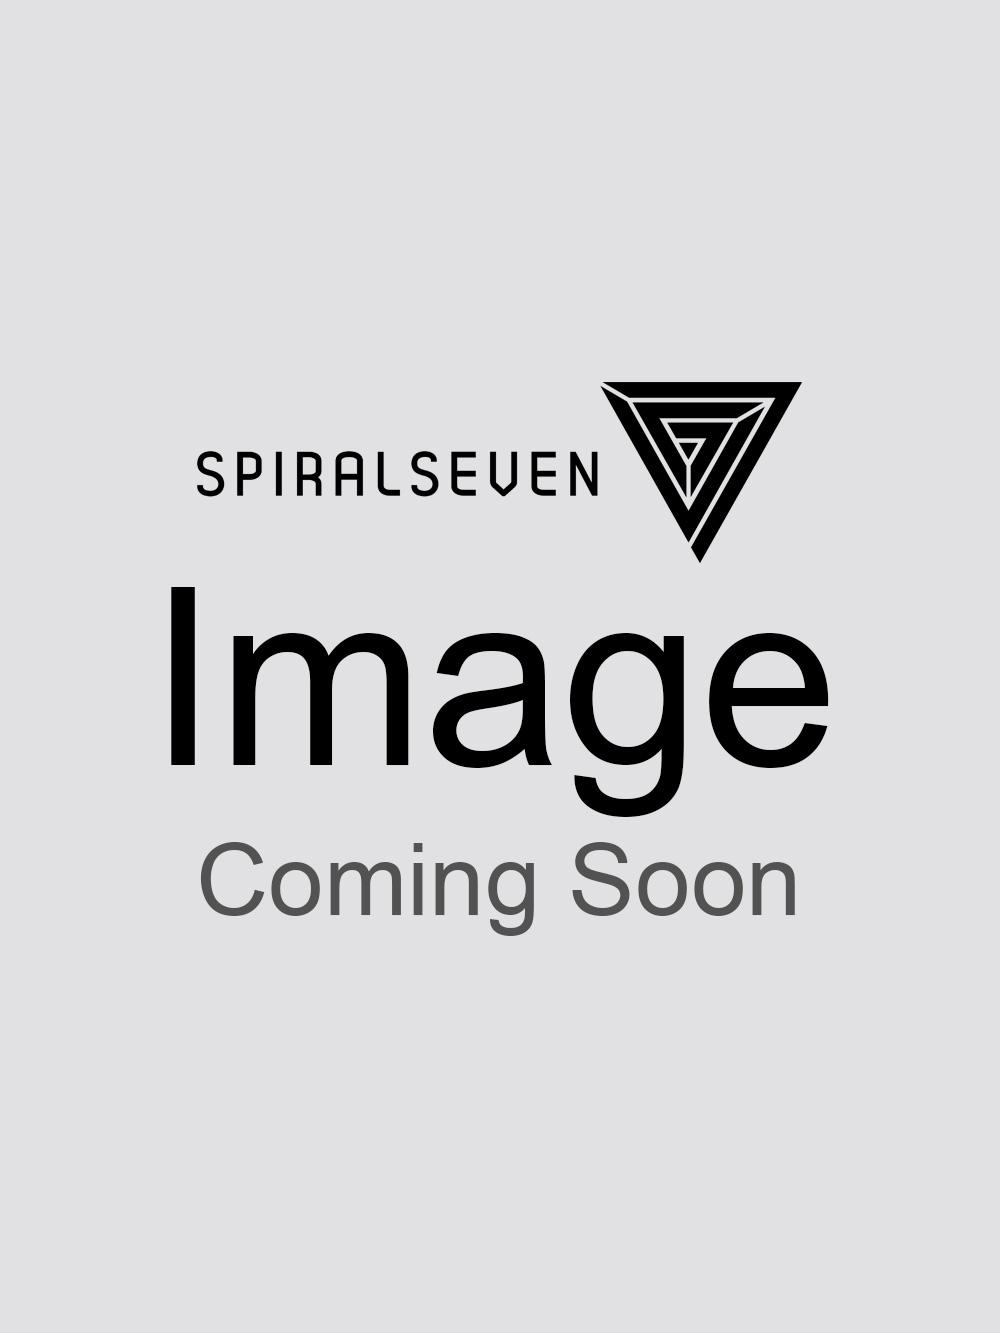 a2f3a533 Sik Silk S/S Jeremy Vine Raglan Curved Hem T-Shirt White | Spiral Seven -  Designer Clothing